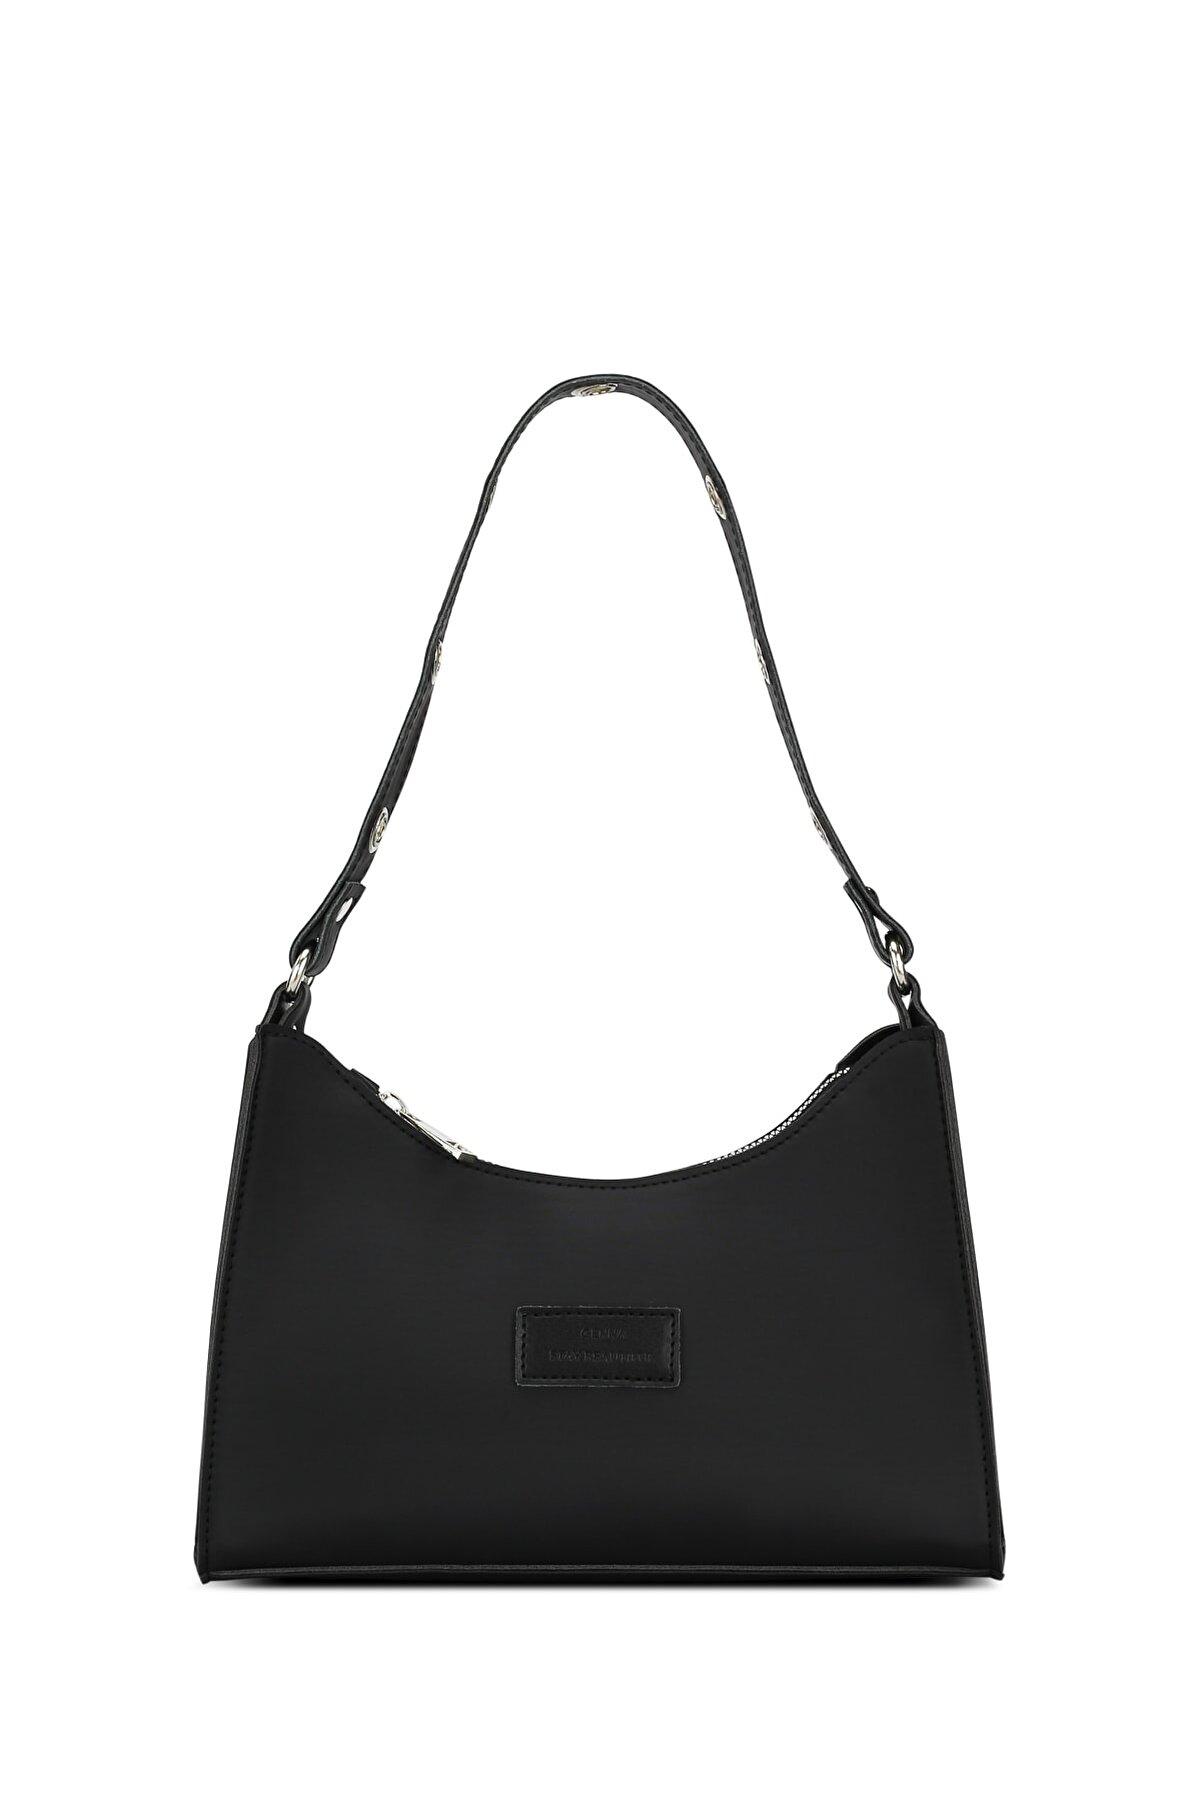 Housebags Kadın Siyah Soft Baguette Çanta 195